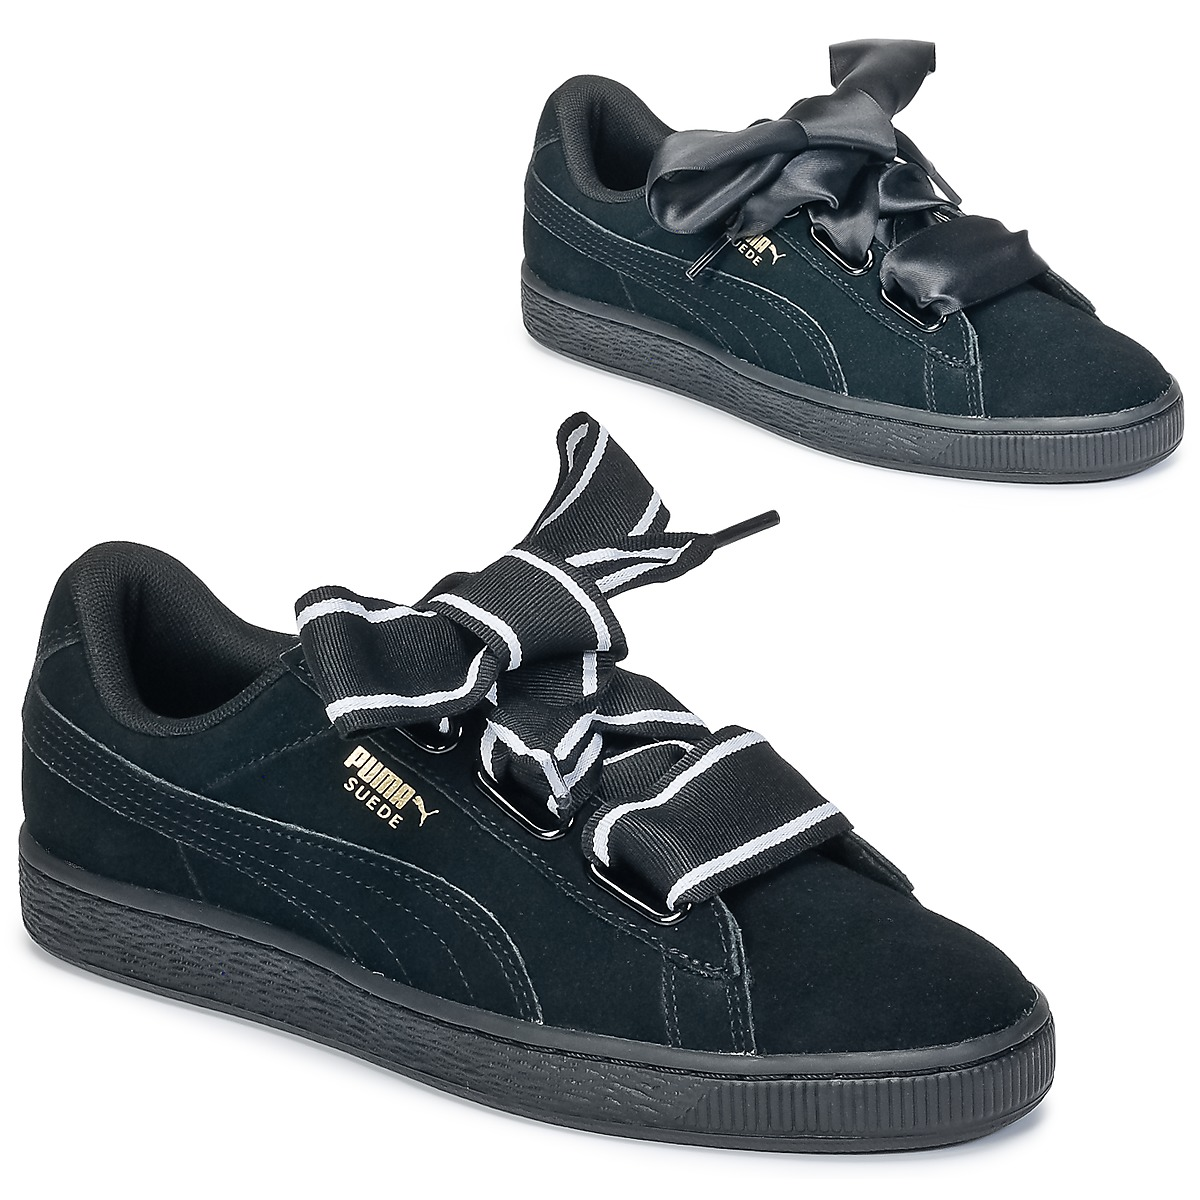 Puma Basket Heart Satin Schwarz - Kostenloser Versand bei Spartoode ! - Schuhe Sneaker Low Damen 79,99 €